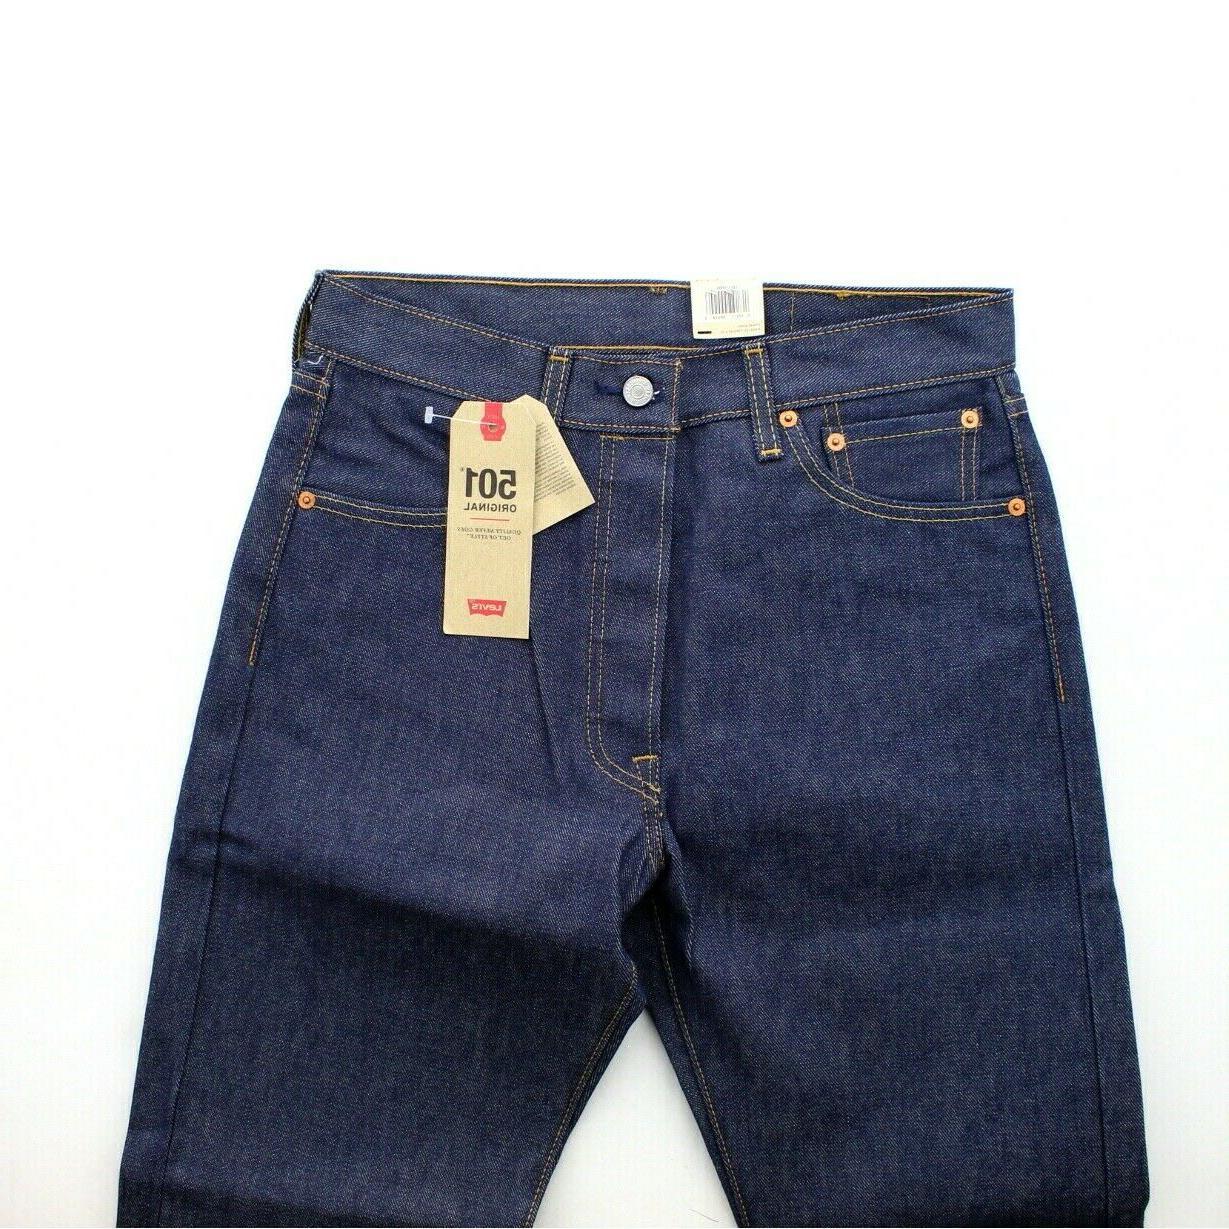 Levi's Jeans Shrink To Fit Leg Denim Jean, Rigid Indigo, $59